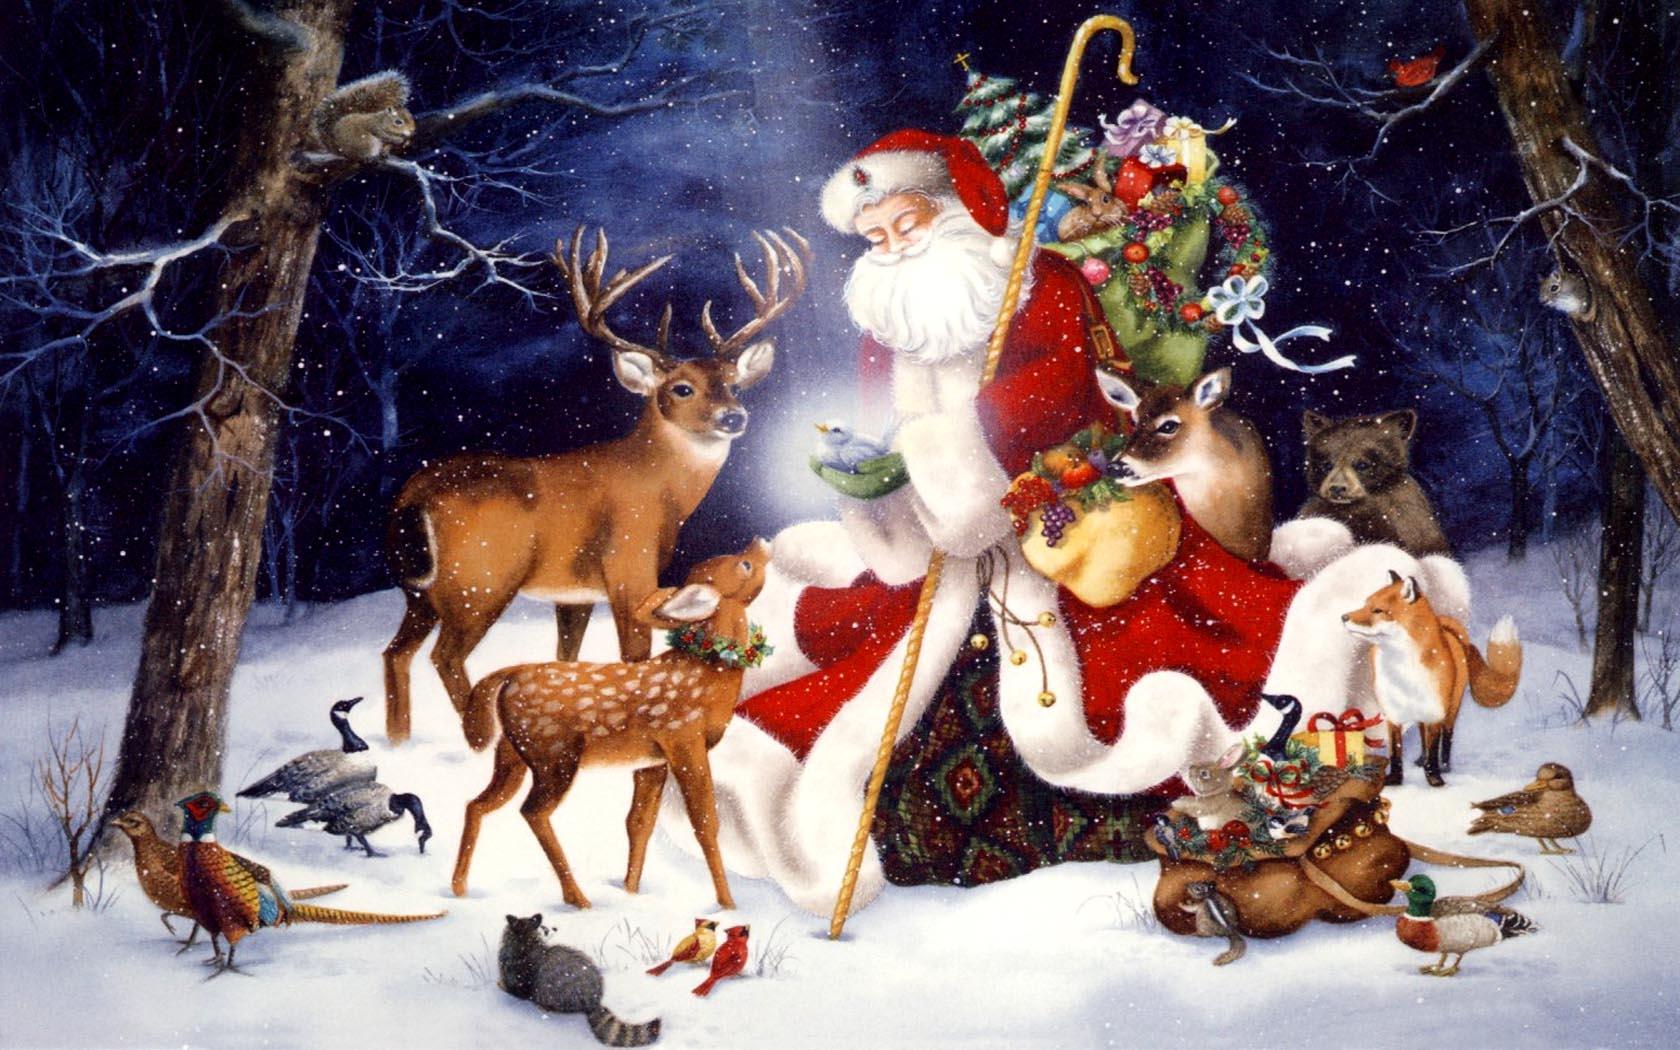 52 Free Christmas Screensavers Backgrounds On Wallpapersafari